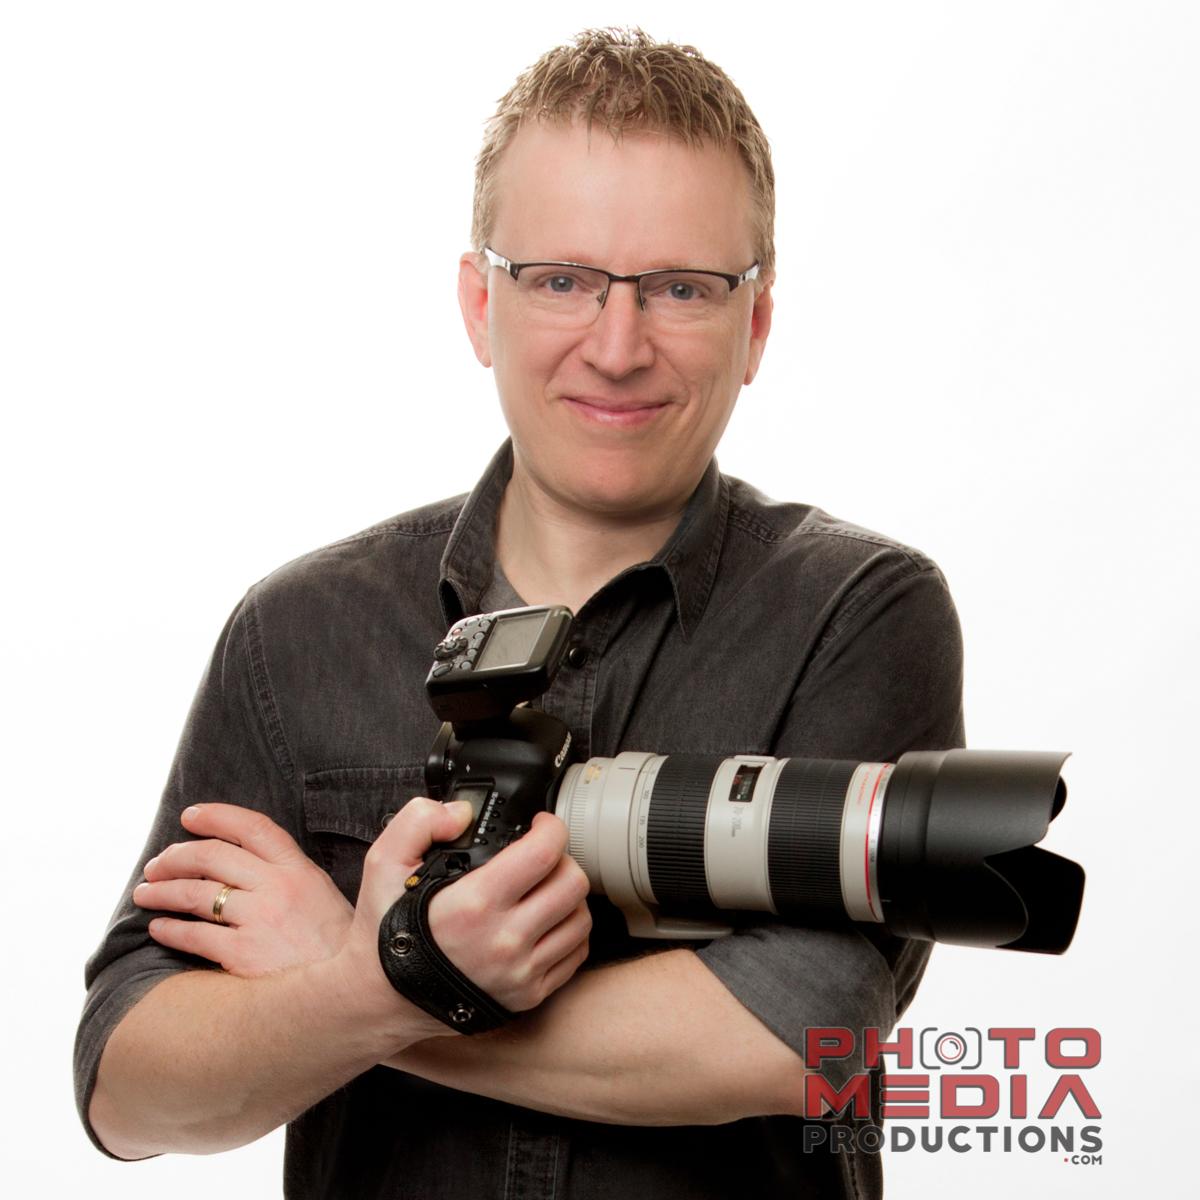 Creative director & photographer